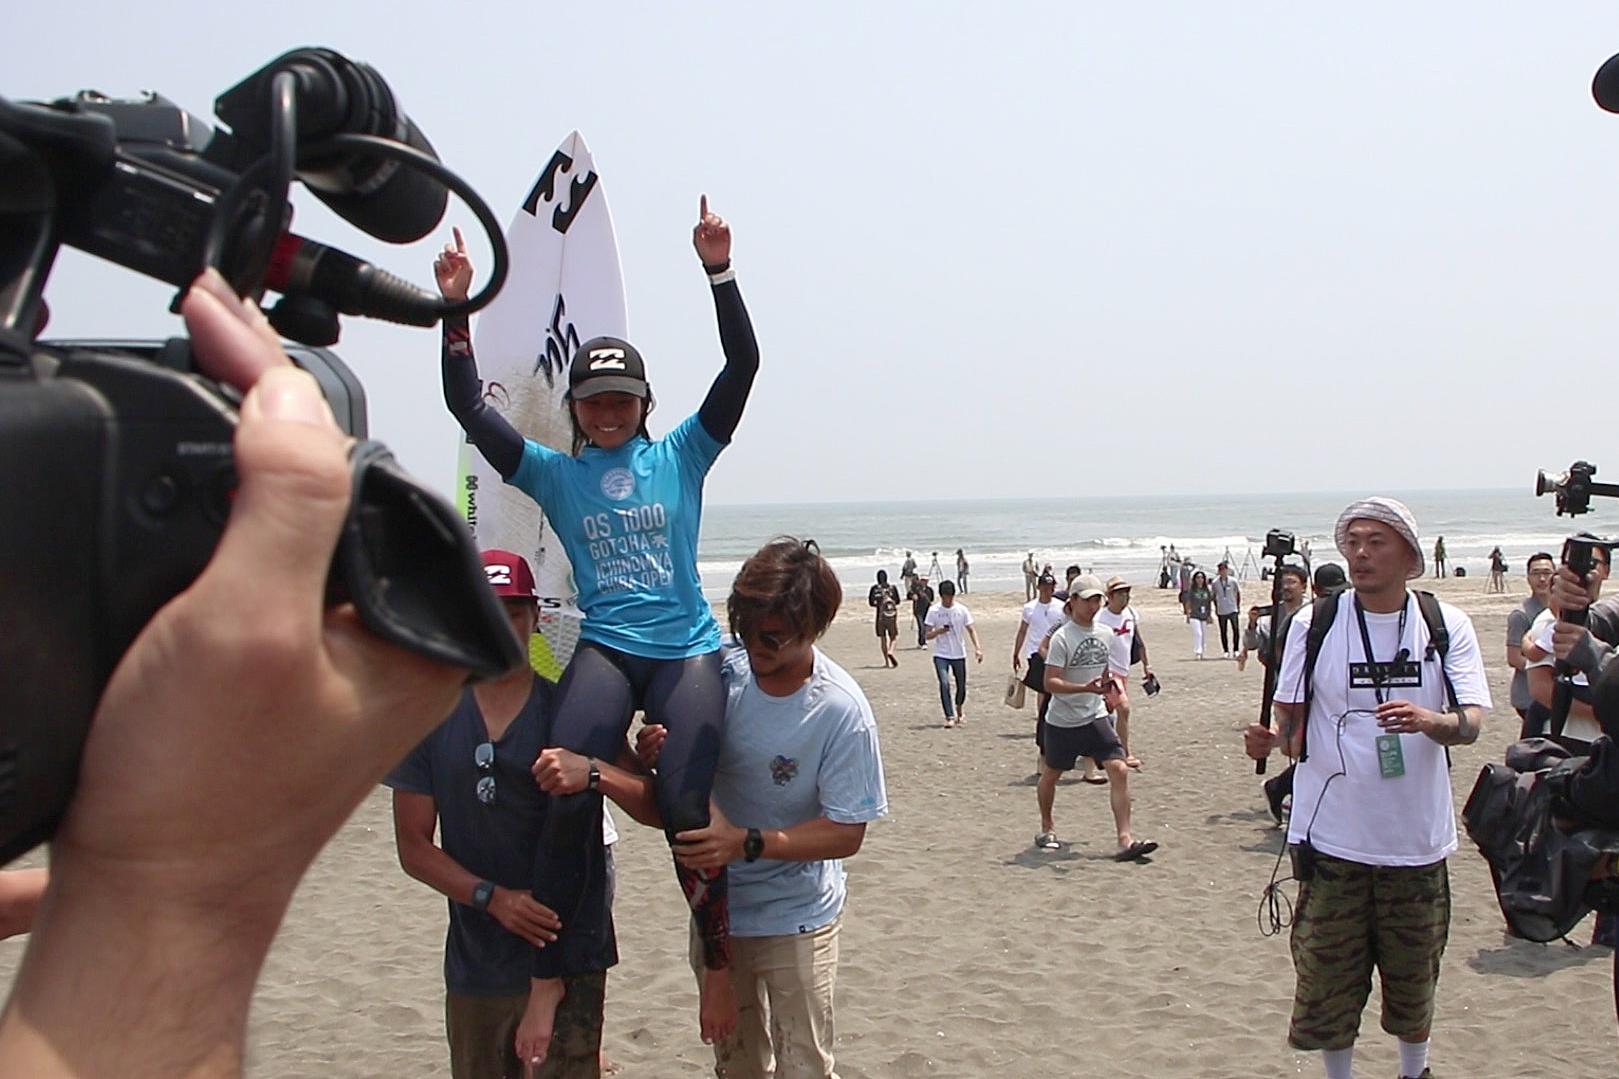 "Shino Matsuda won the title ""Women's QS 1,000 Ichinomiya Chiba Open""! ー「Women's QS 1,000 Ichinomiya Chiba Open」にて松田詩野選手が優勝!"